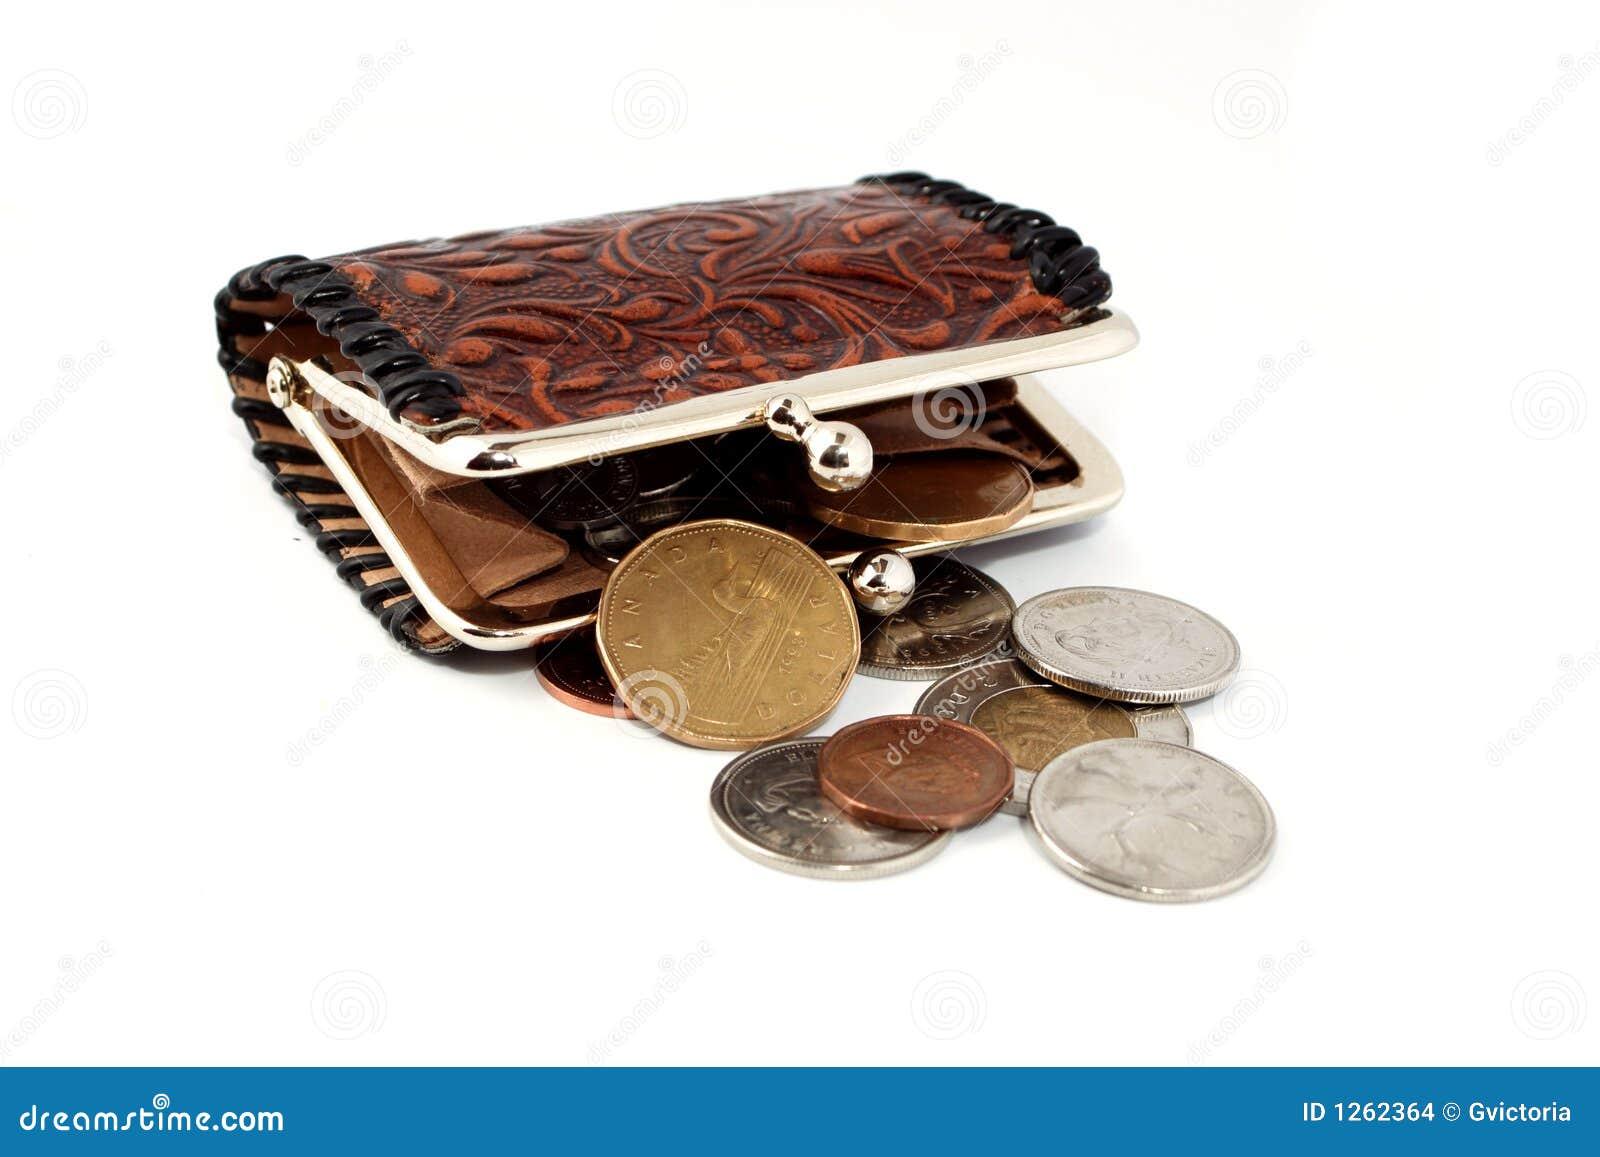 Money Change Purse Stock Images - Image: 1262364